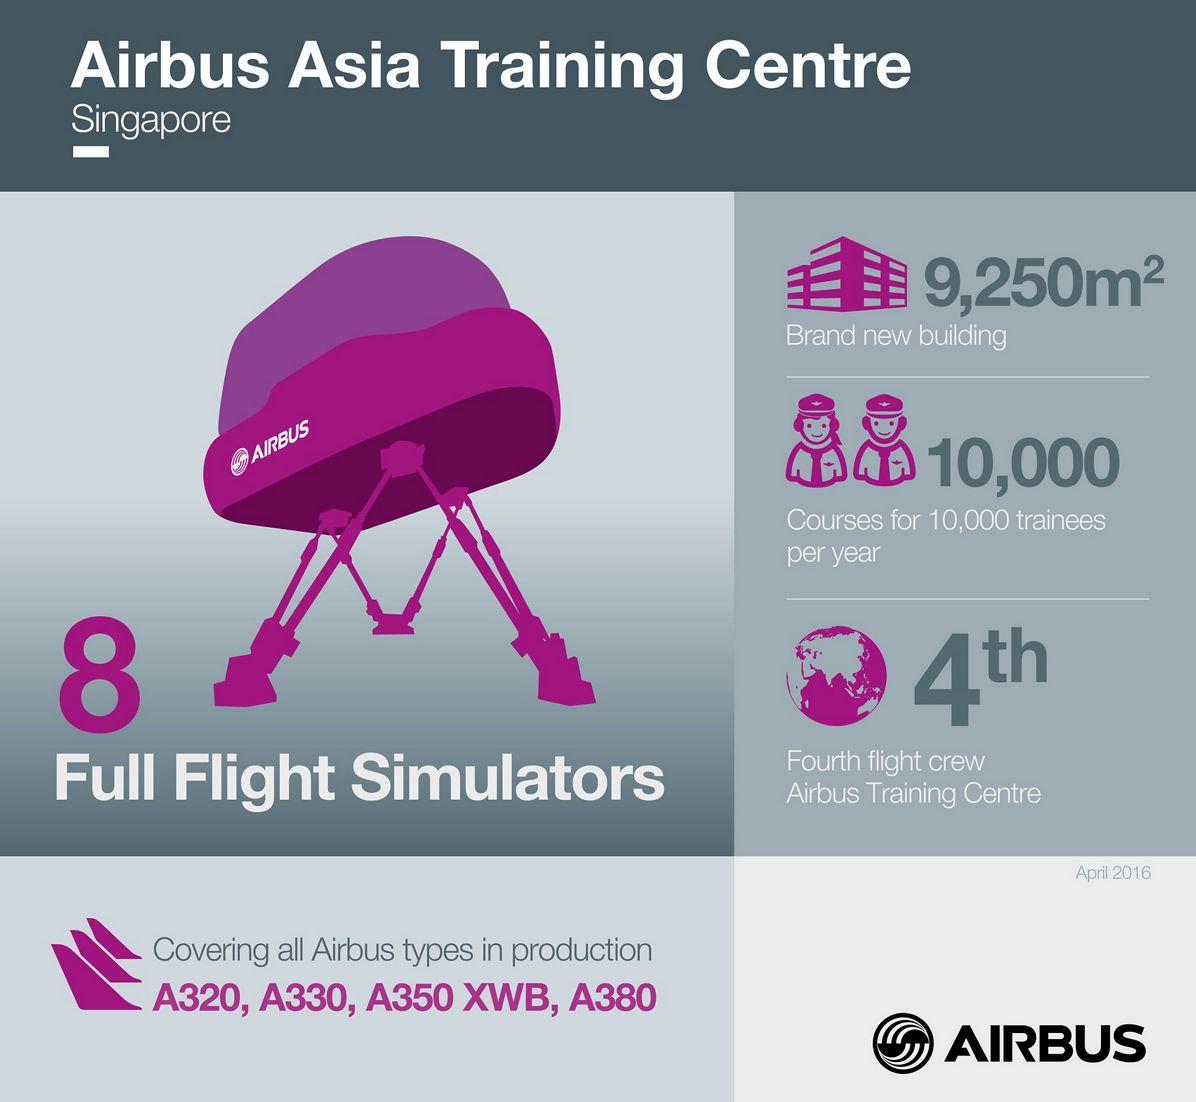 AATC_Infographicsv2, Airbus Asia Training Centre_Infographic_April 2016